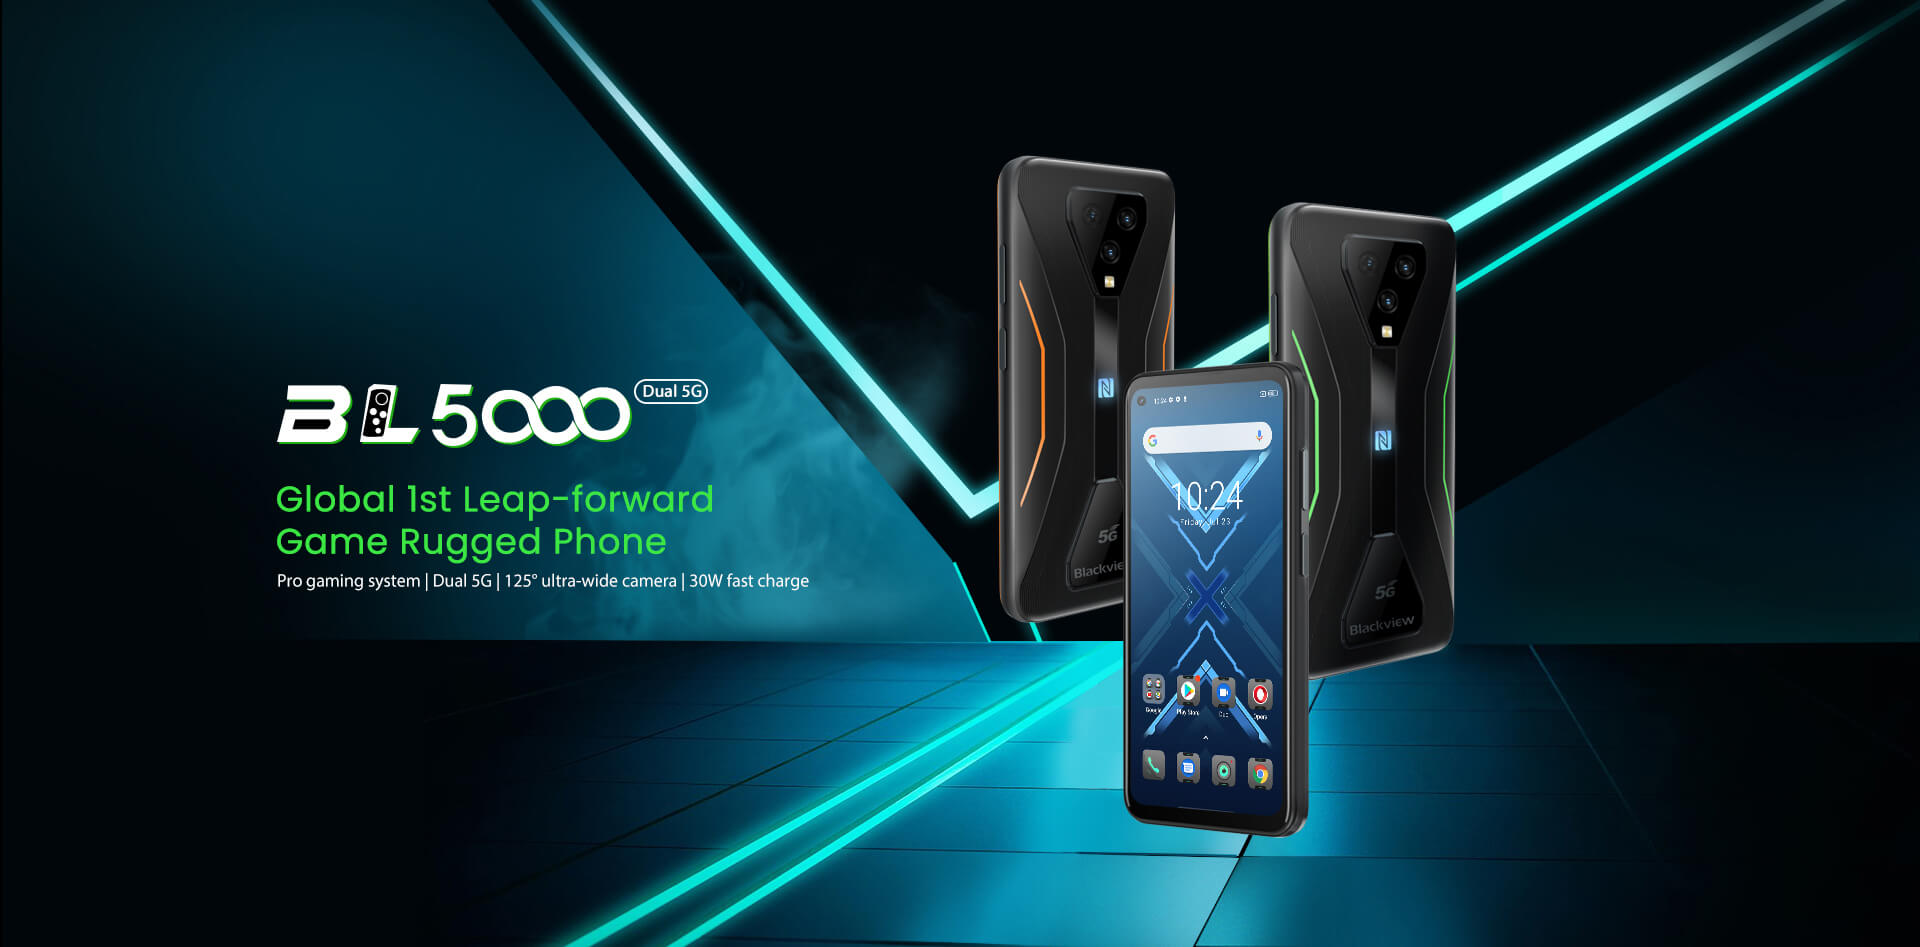 smartfon Blackview BL5000 gaming smartphone